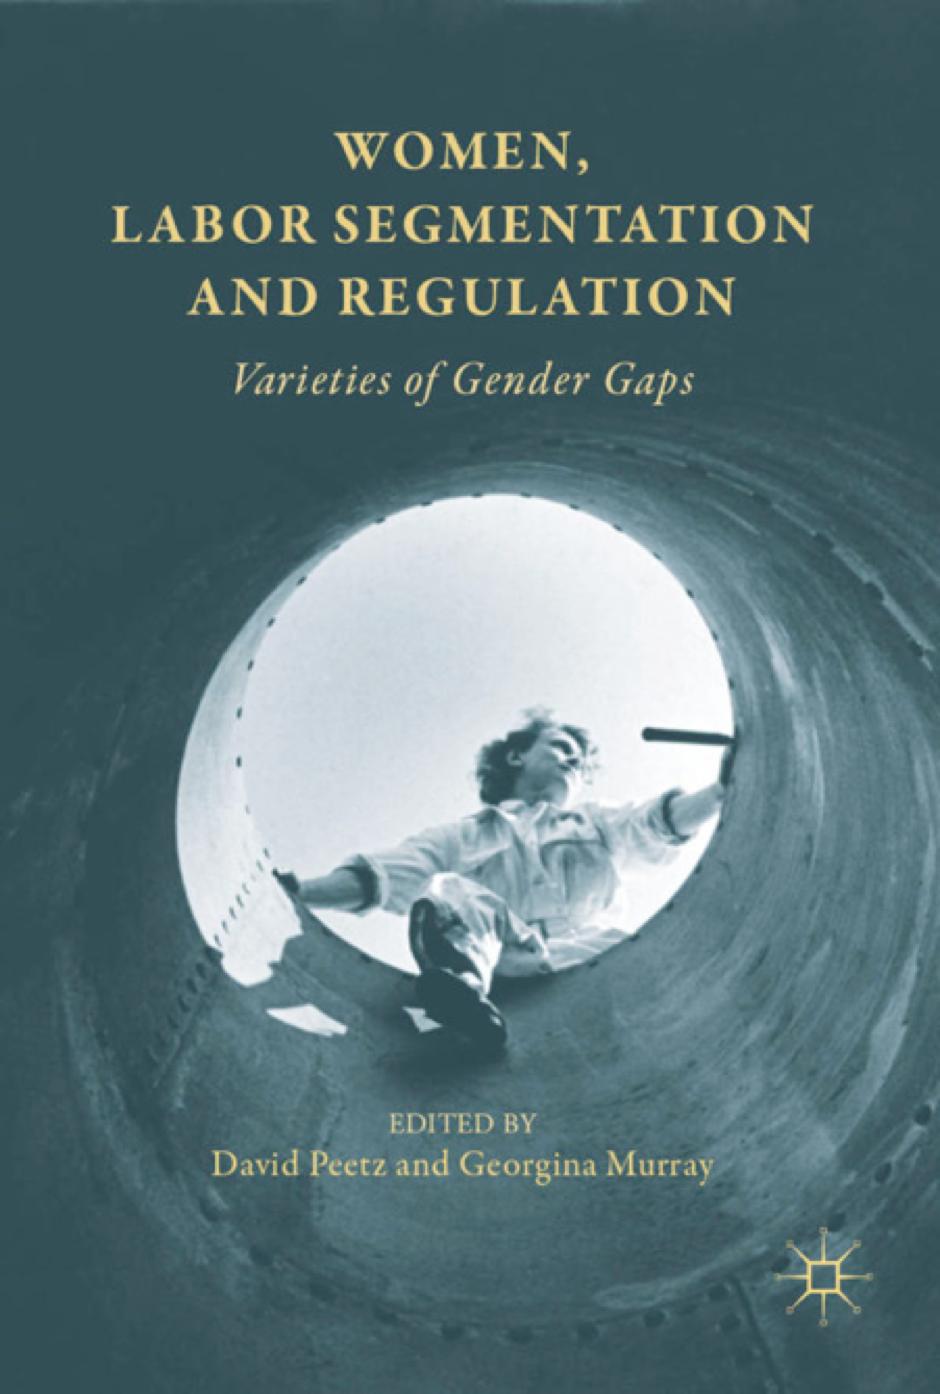 Women, Labor Segmentation and Regulation